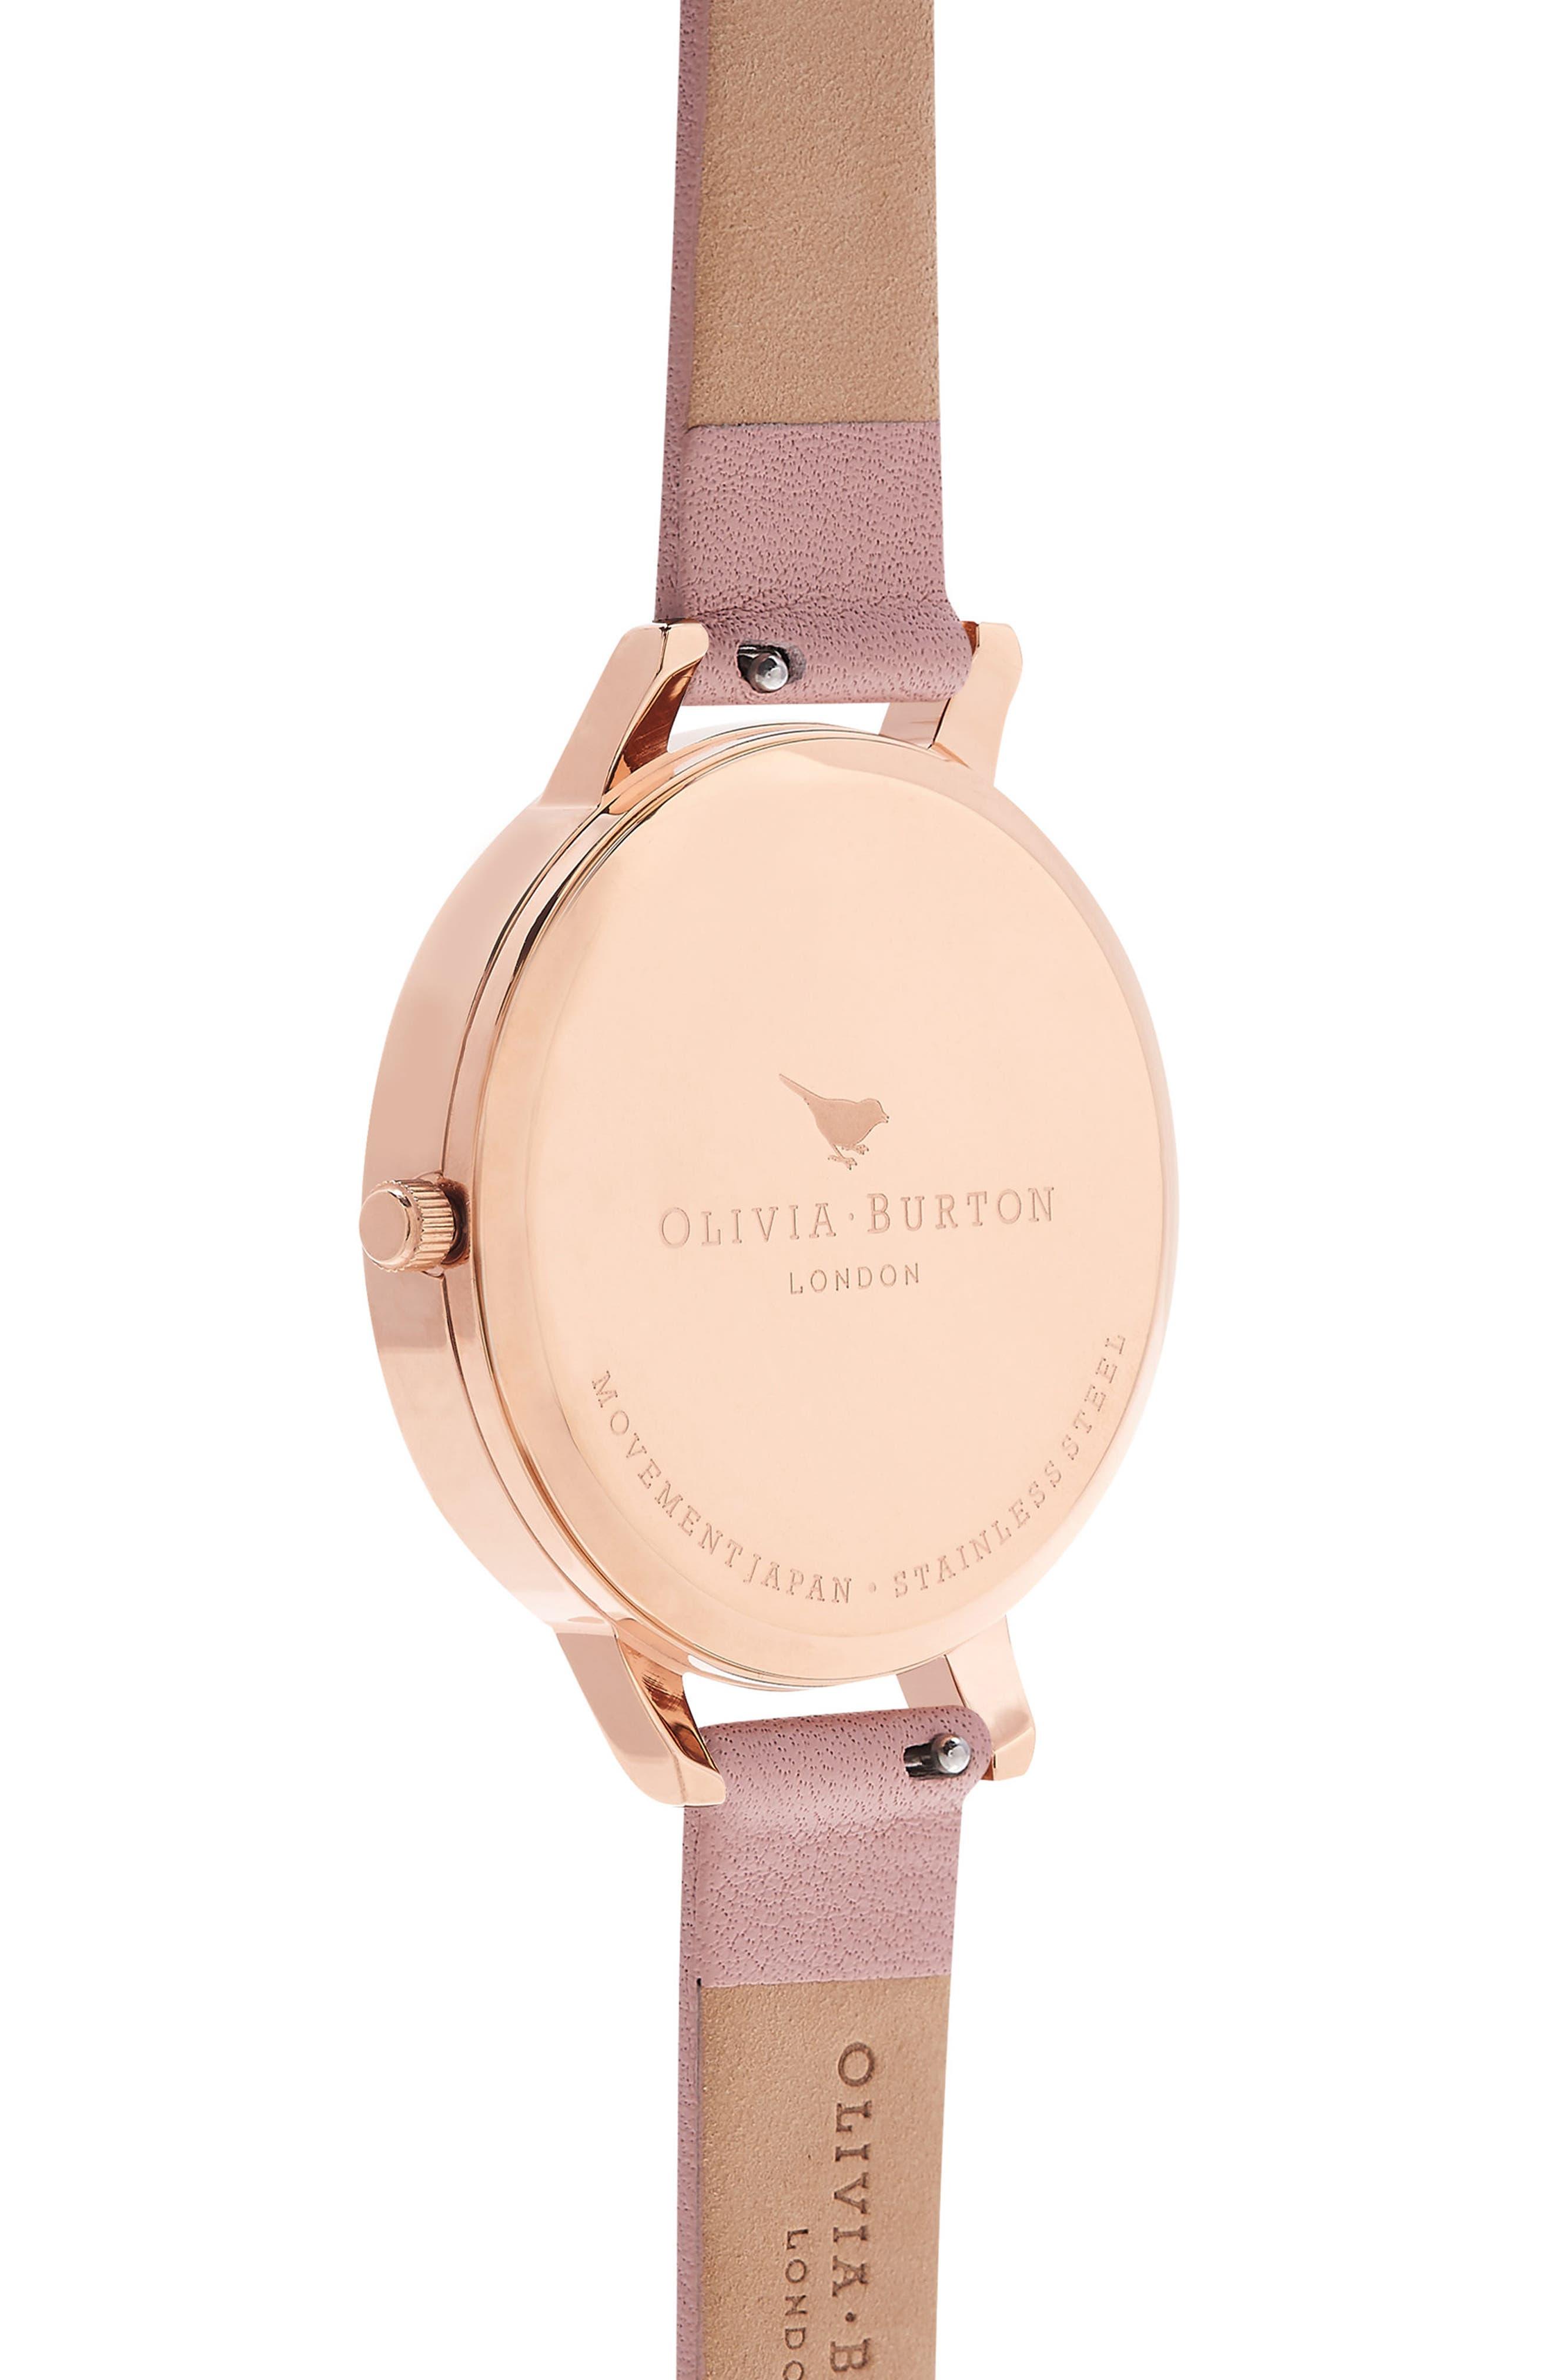 OLIVIA BURTON, Signature Florals Leather Strap Watch, 38mm, Alternate thumbnail 2, color, 650